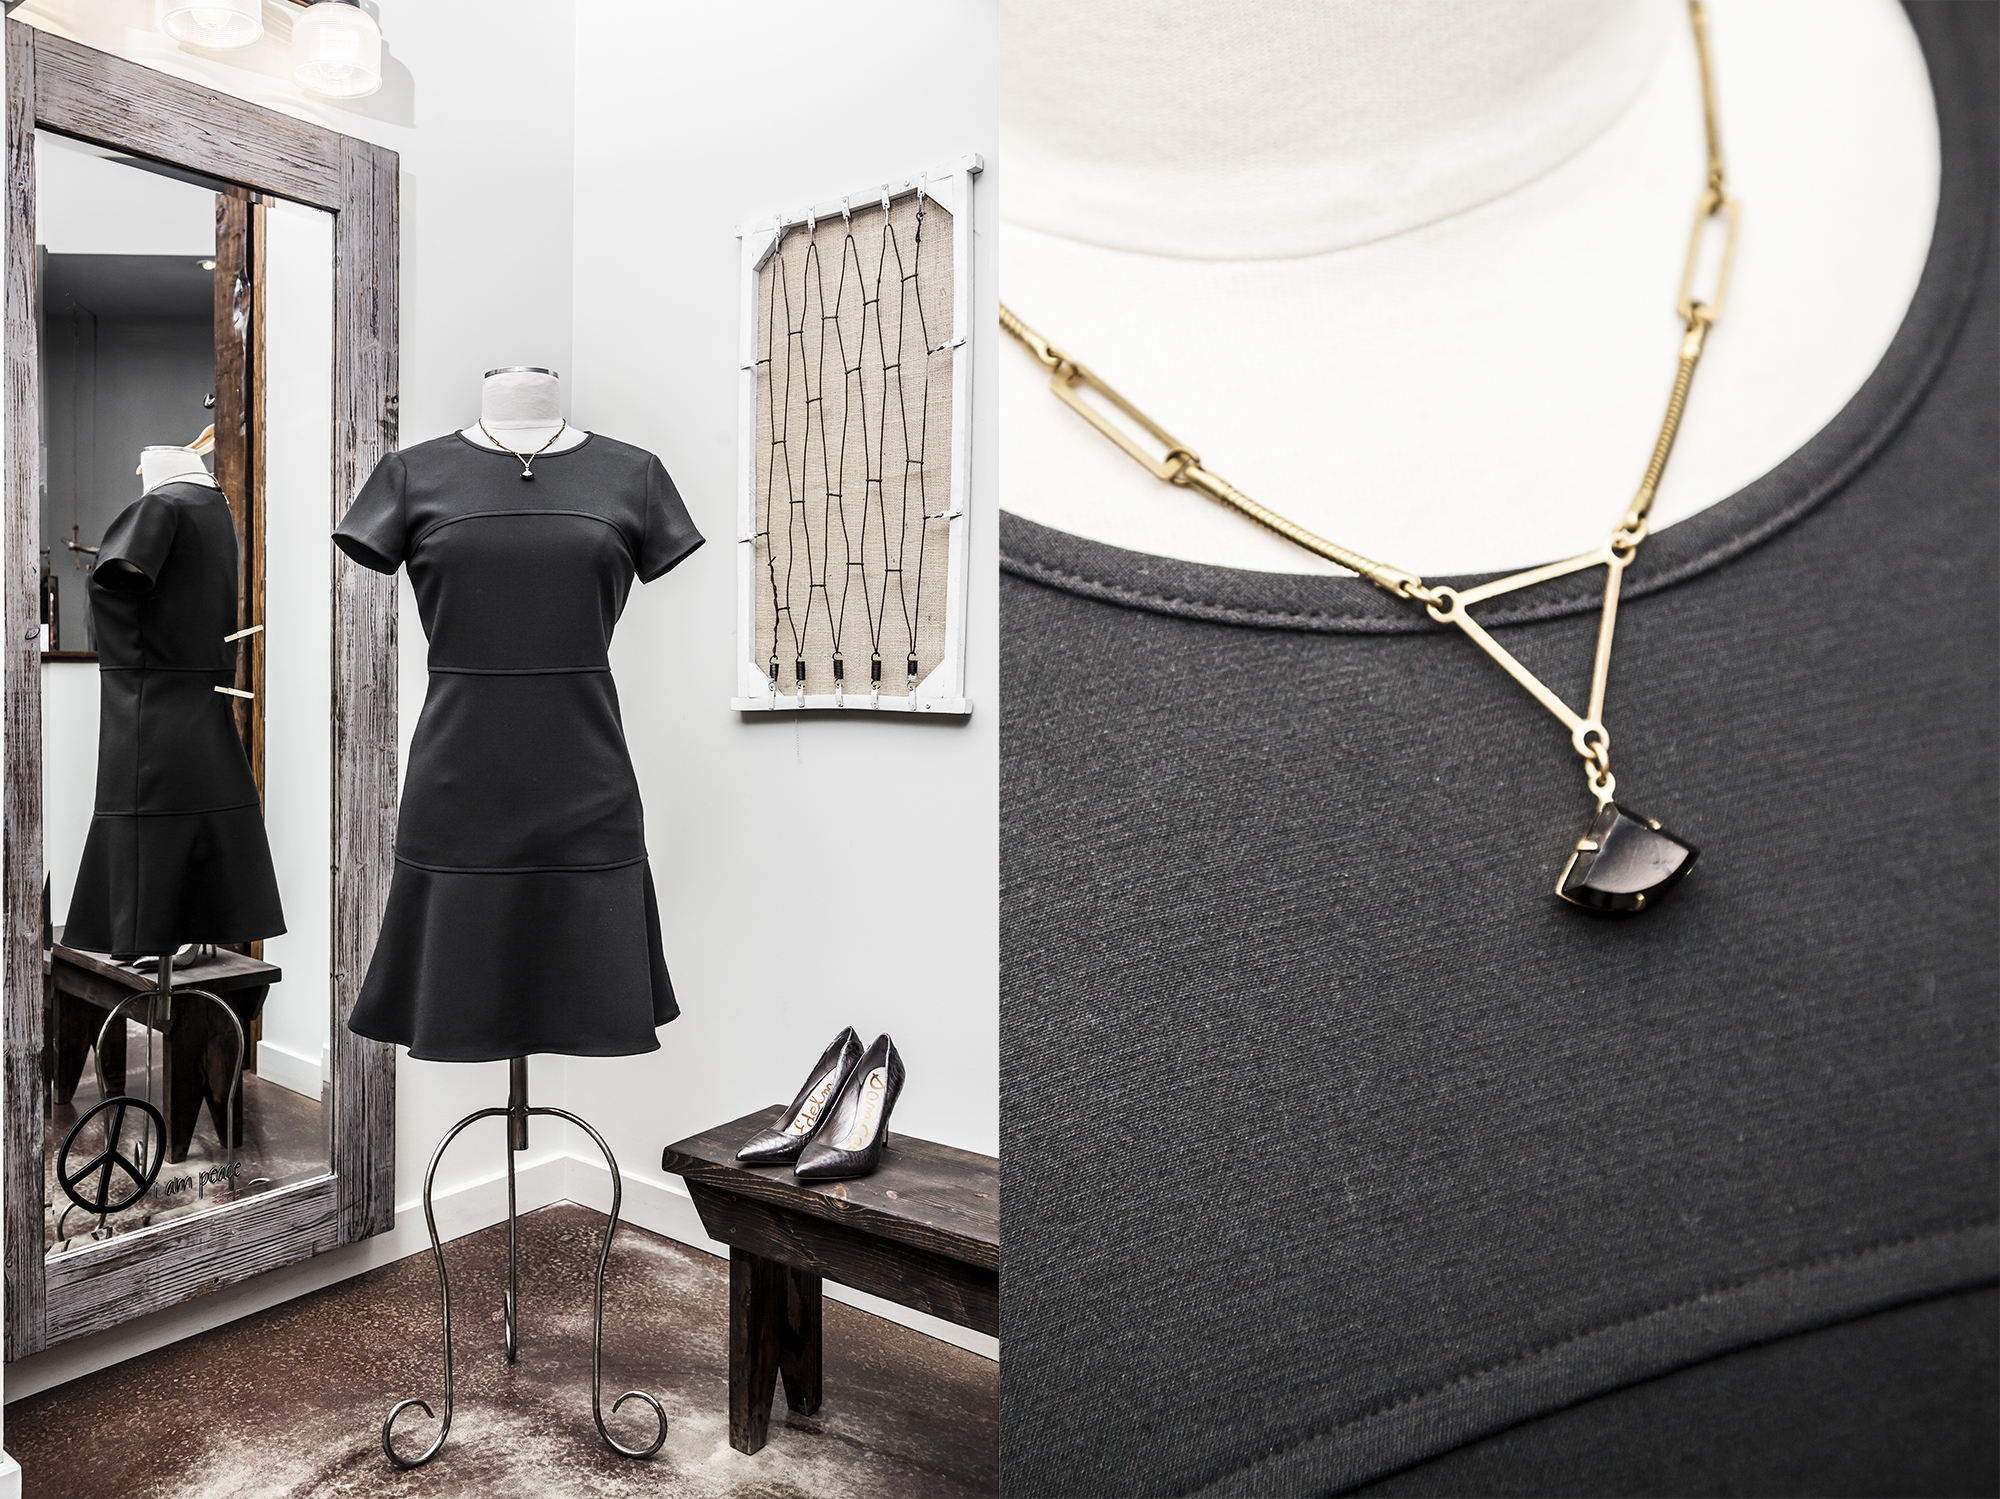 womens-fashion-boutiques-edmonton-sherwood-park-and-st-albert-bella-maas